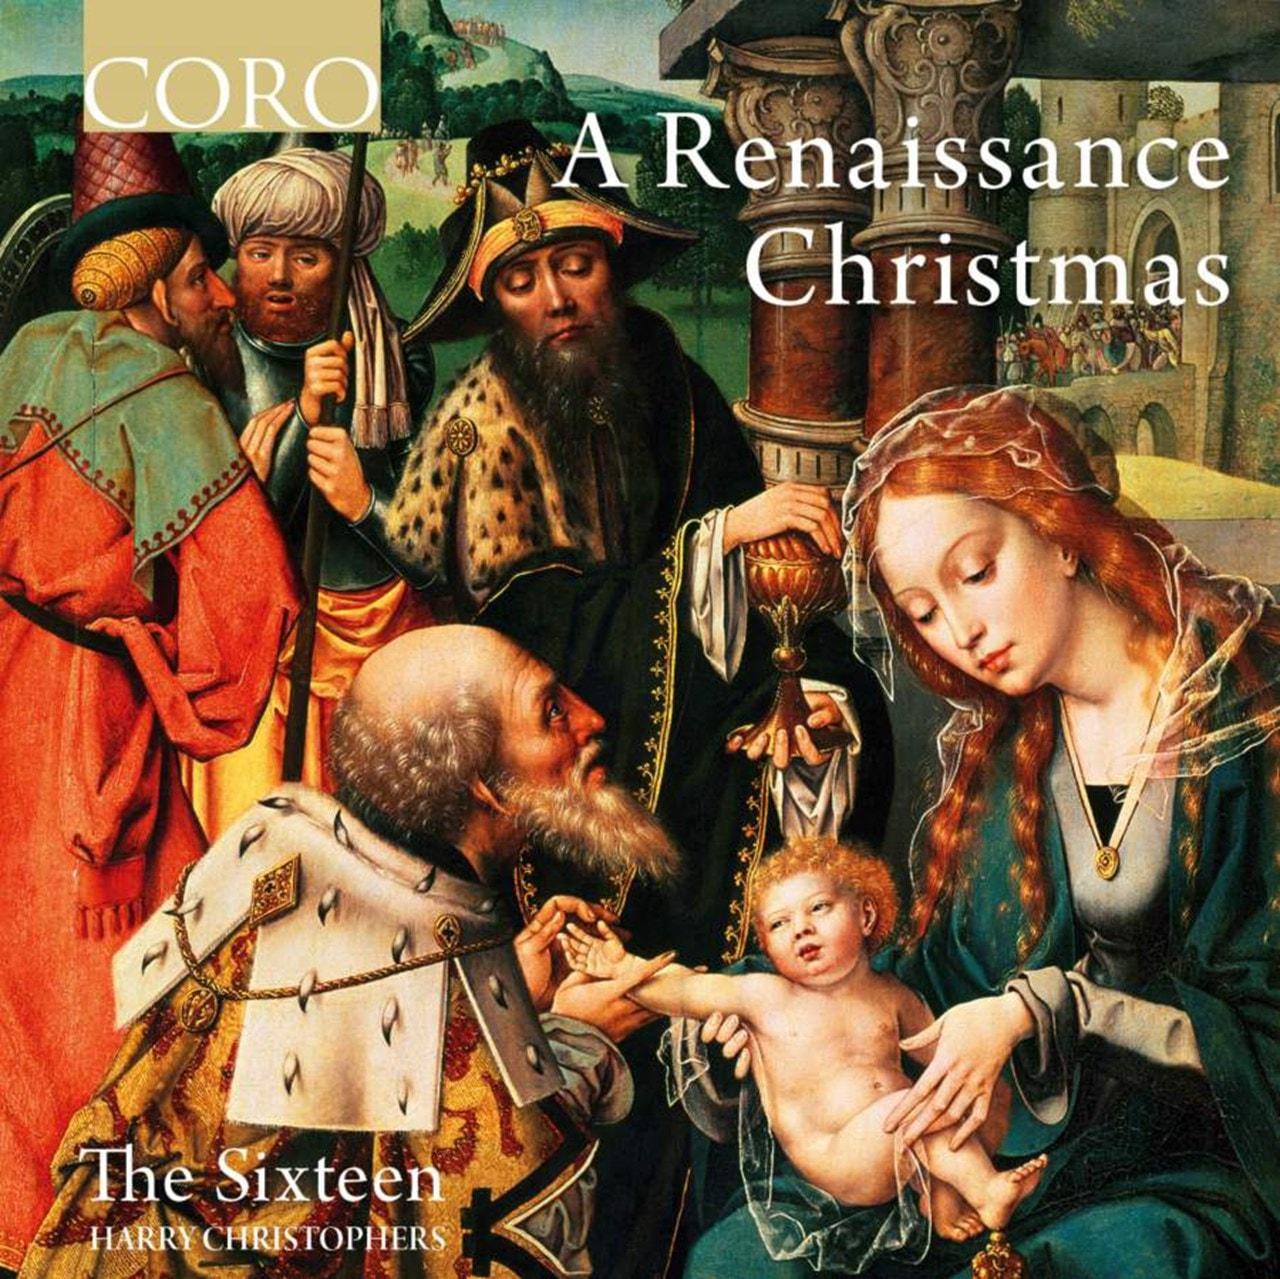 The Sixteen: A Renaissance Christmas - 1